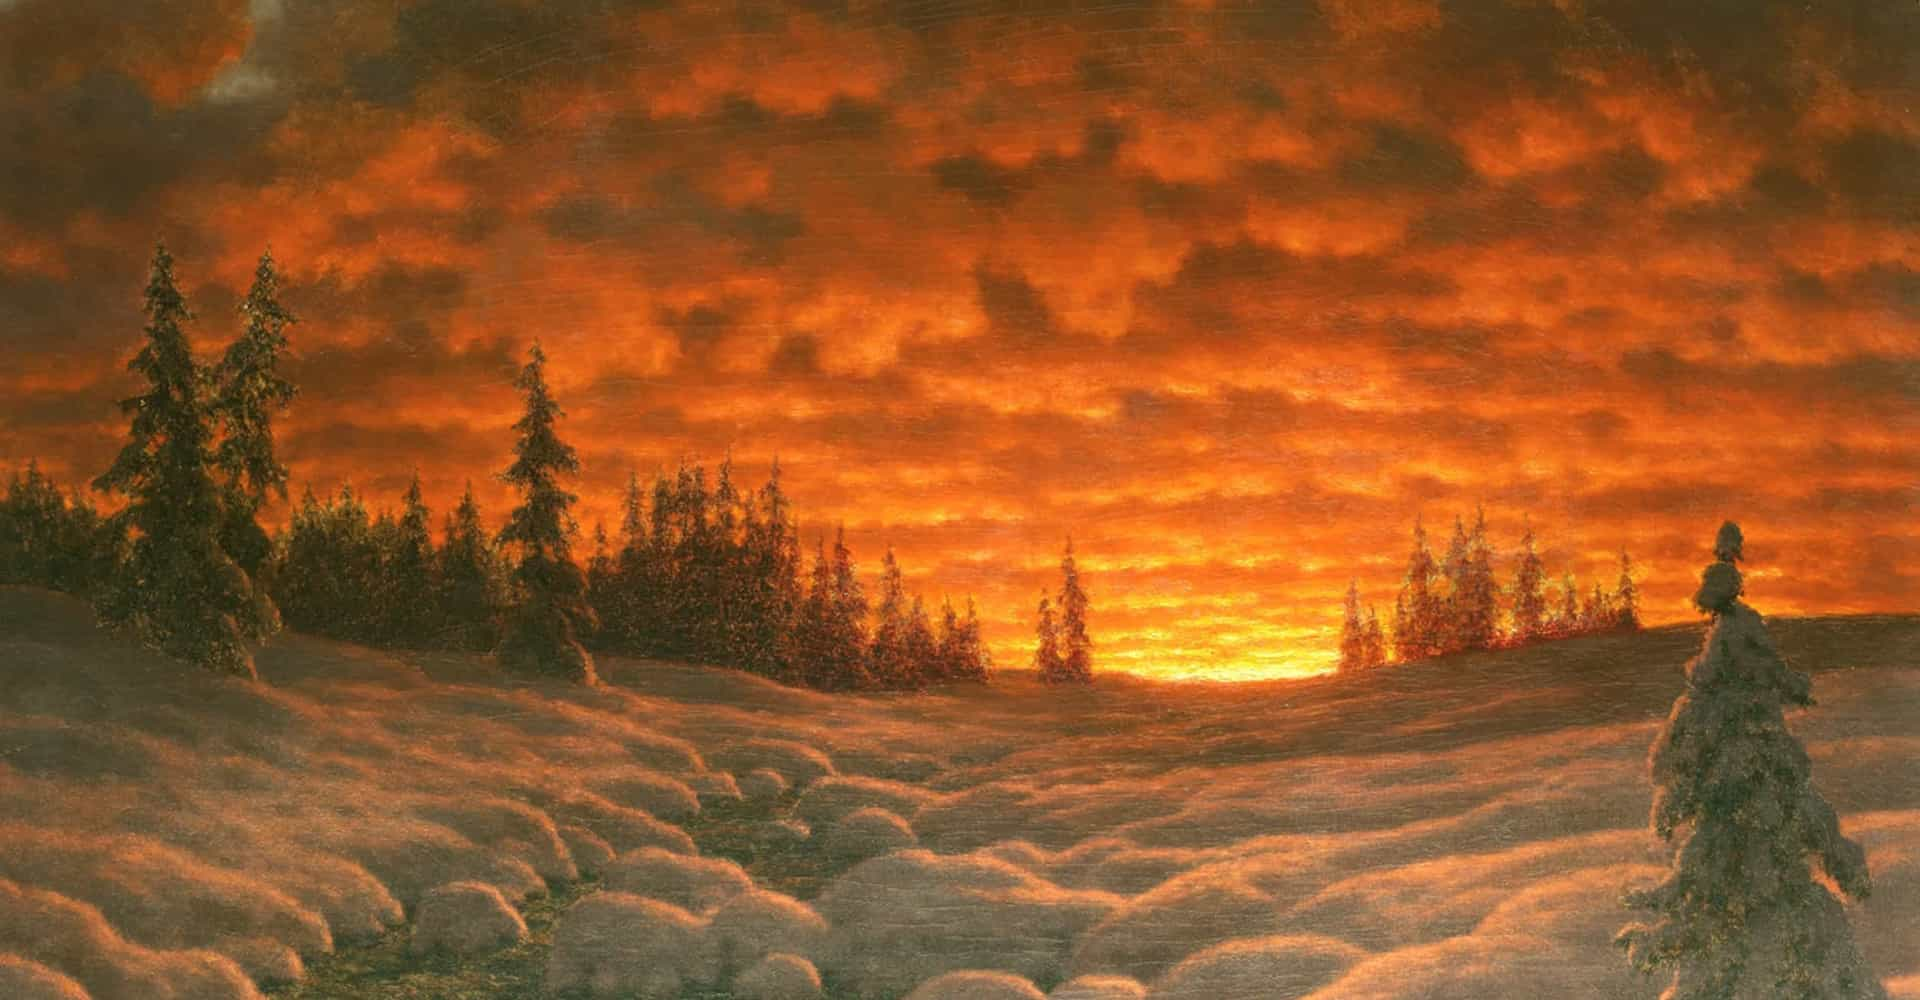 Wonderful paintings that describe winter